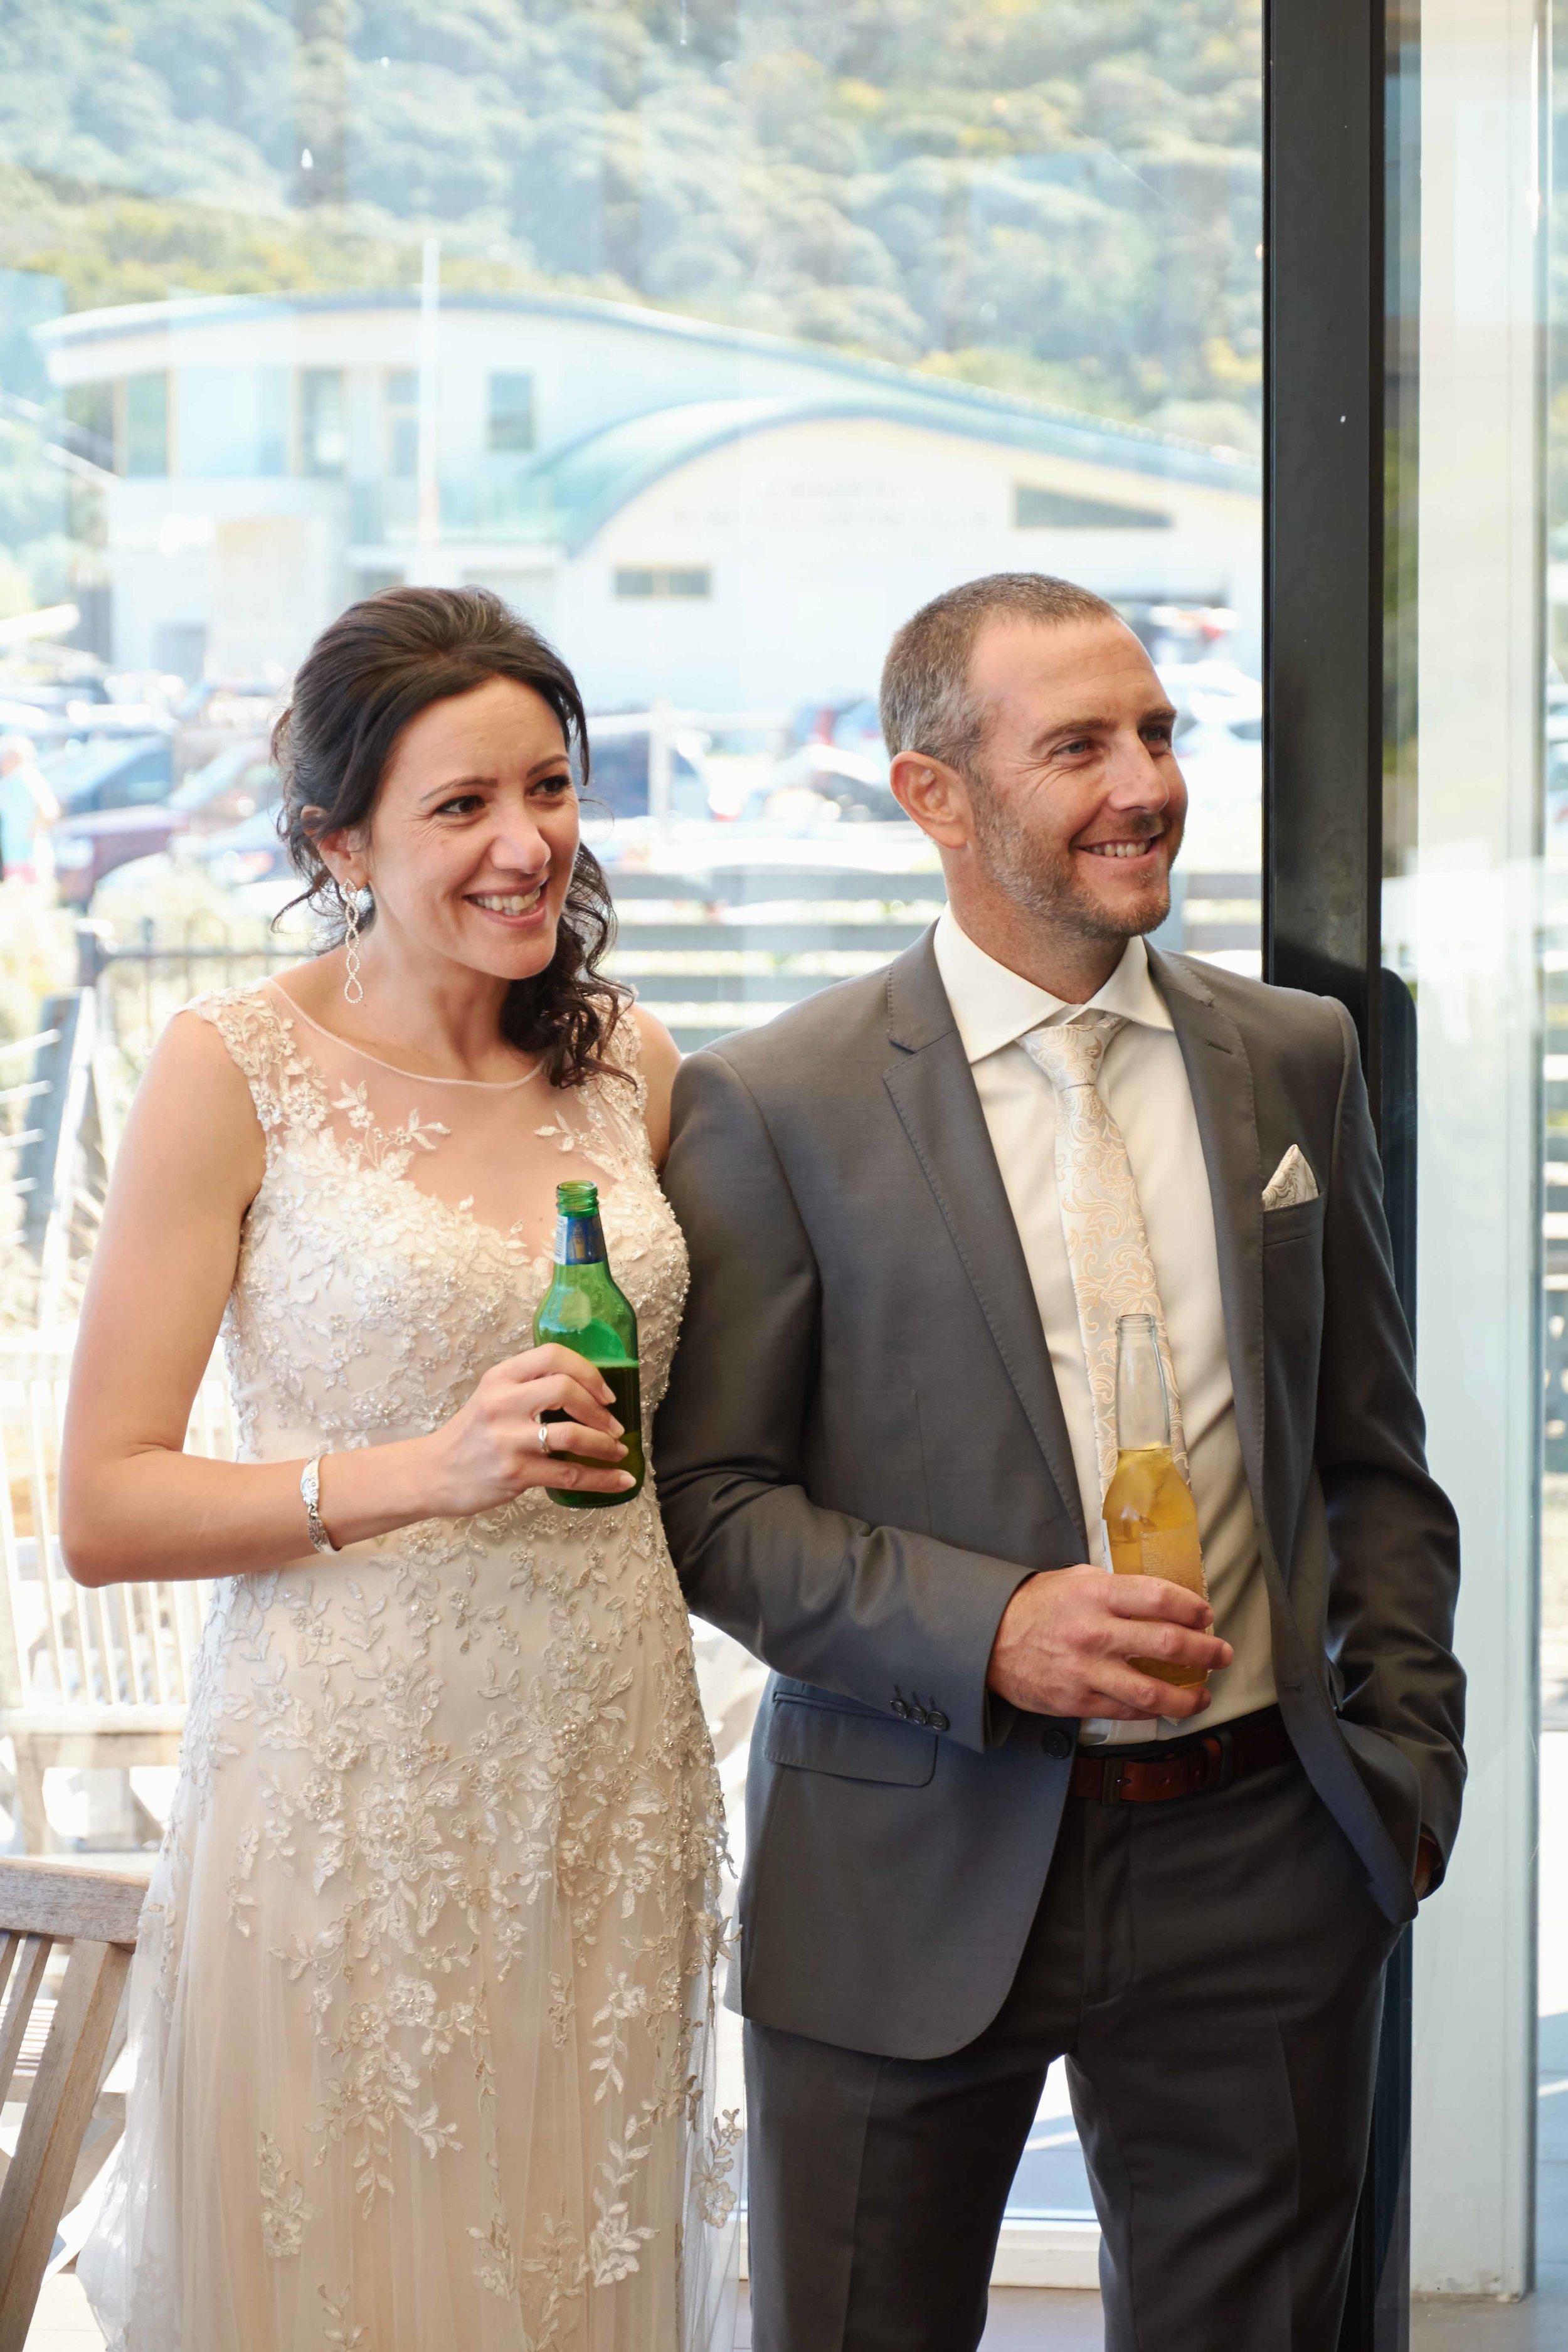 sorrento-wedding-photography-all-smiles-marissa-jade-photography-87.jpg